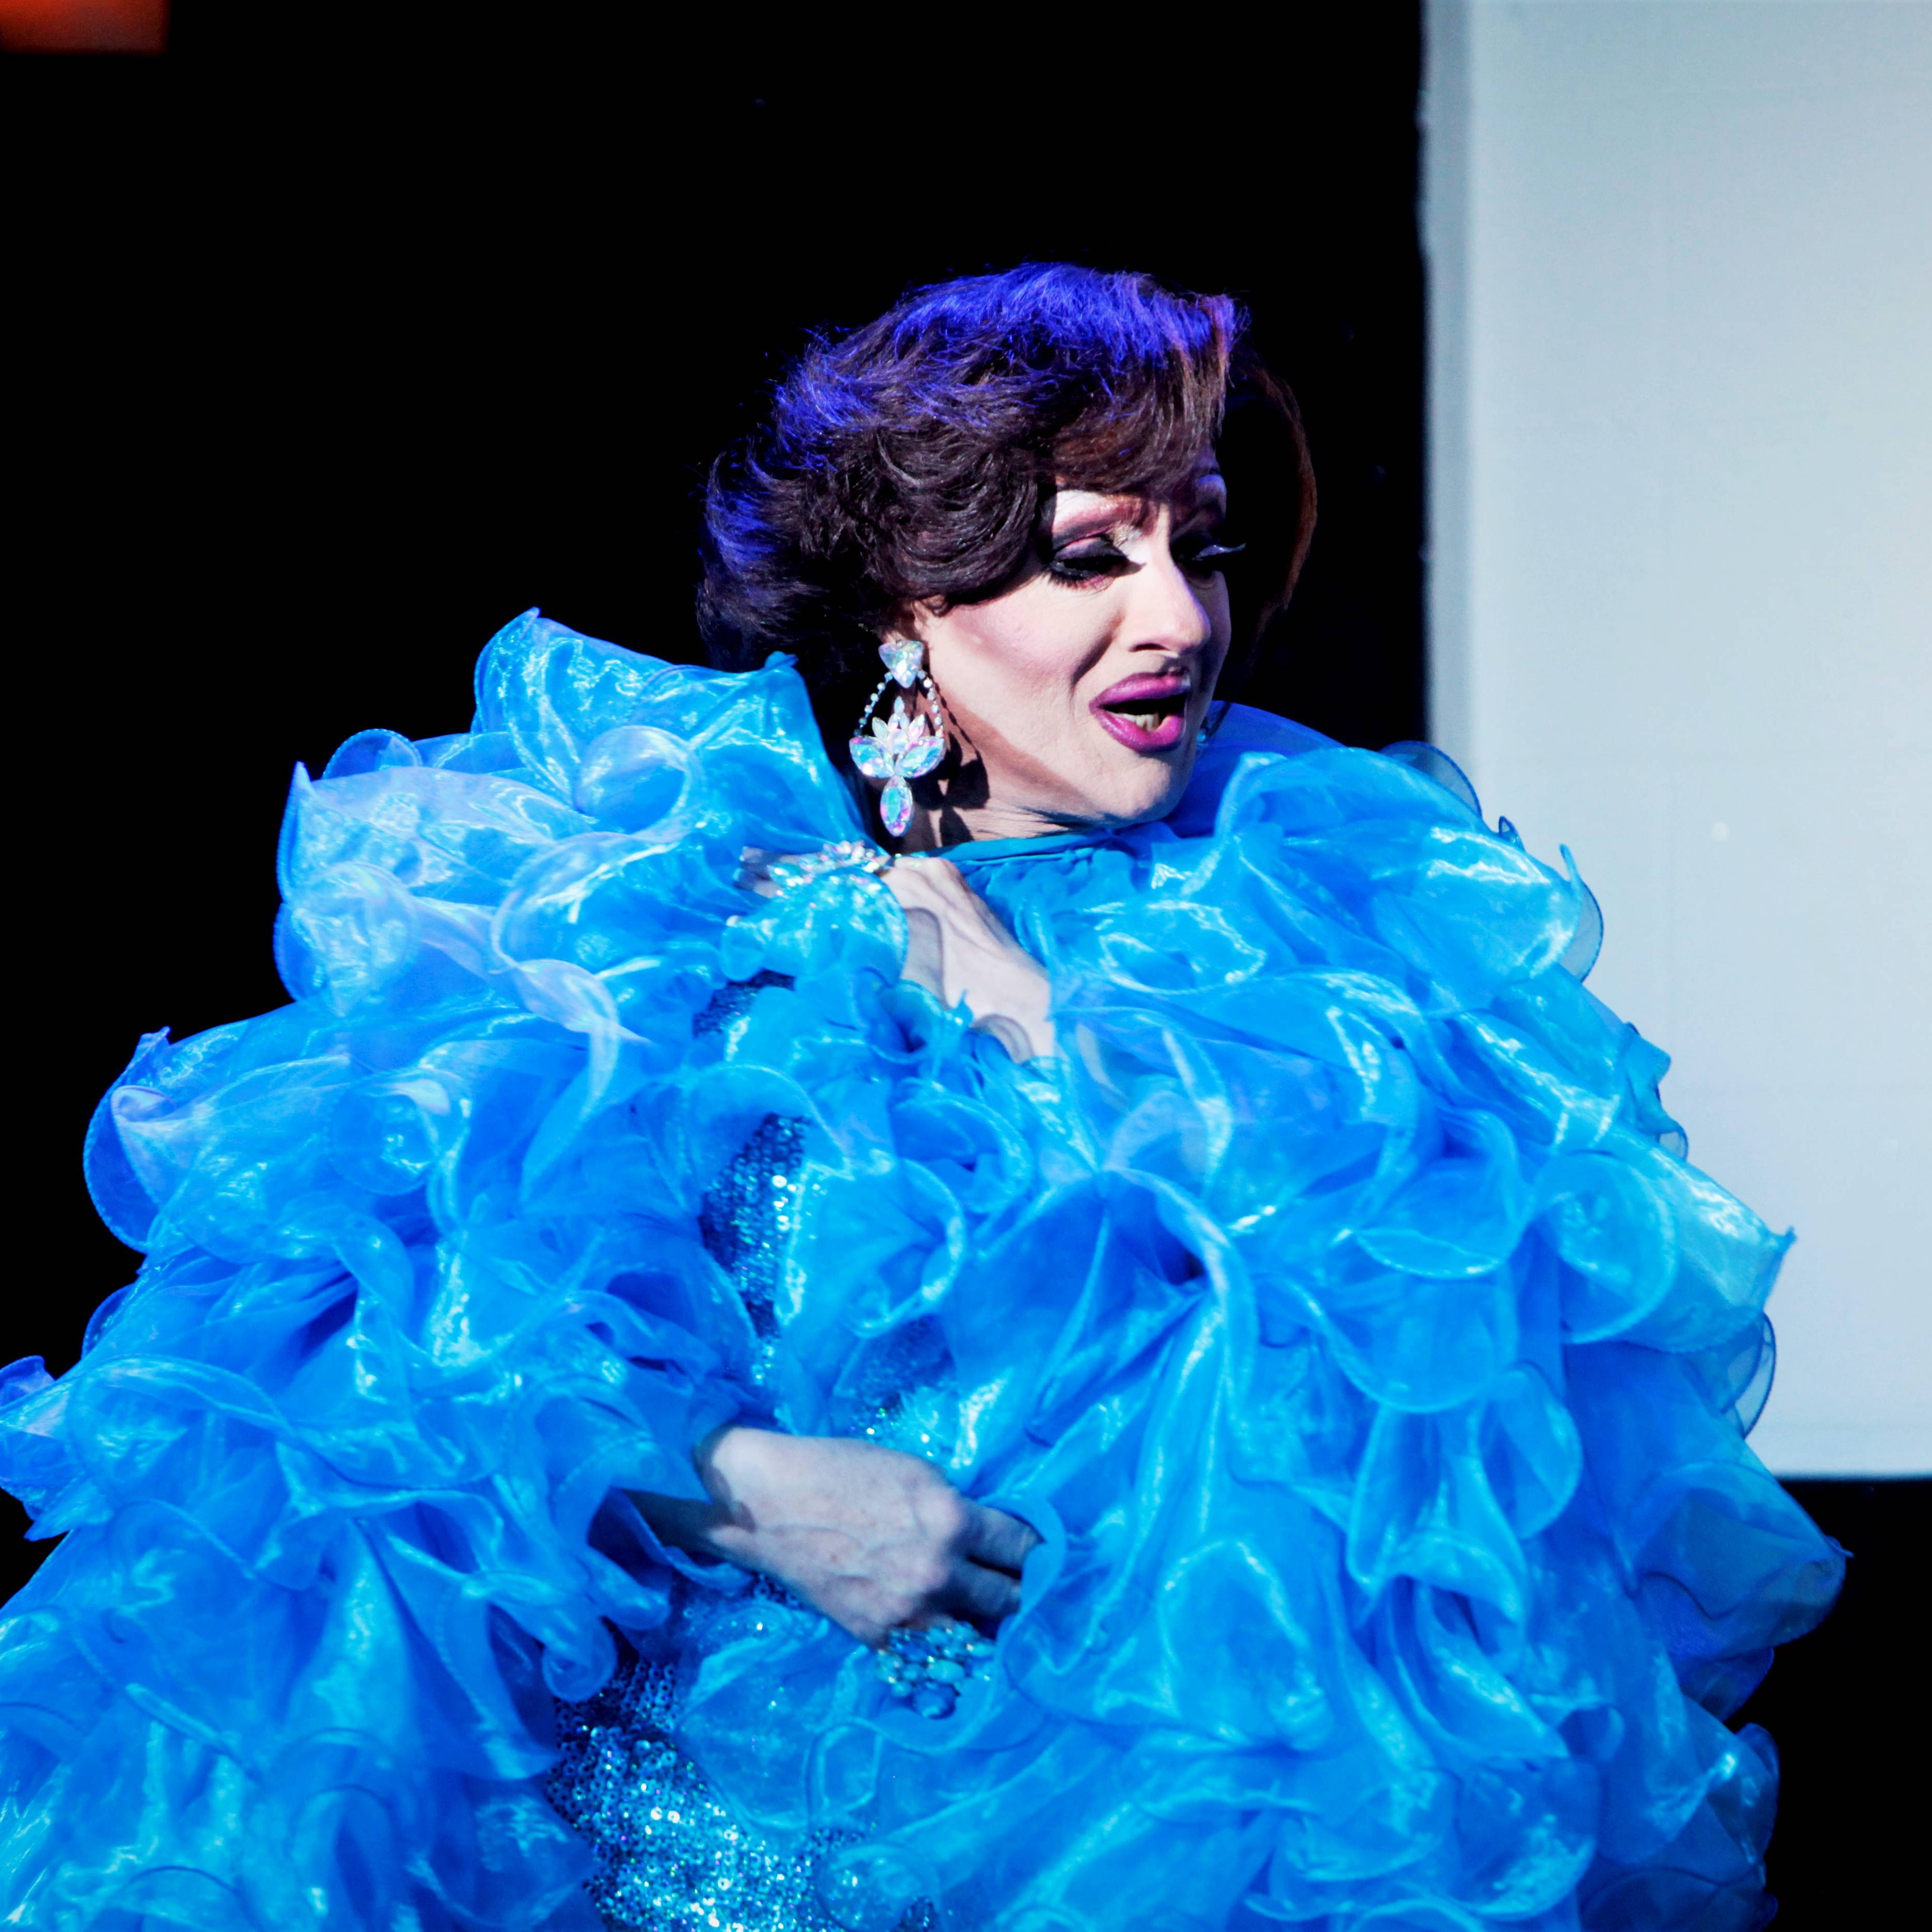 'Not your grandma's bingo': Drag Queen Bingo fundraisers benefiting local nonprofits